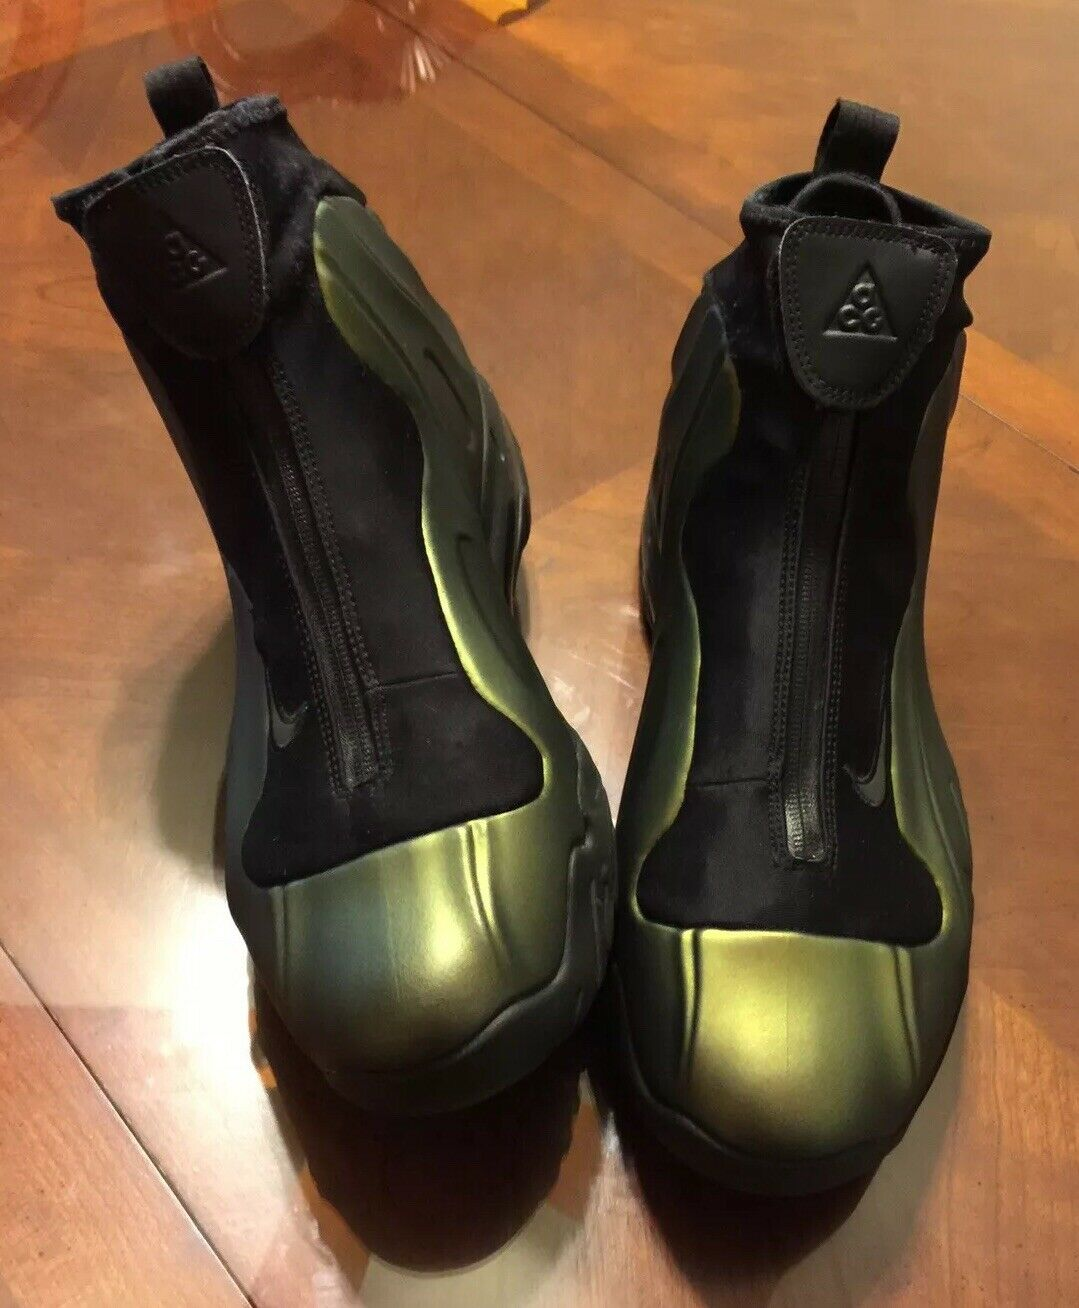 Nike i95 Flightposite Foamposite Boots Posite Metallic gold Sz 10 RARE